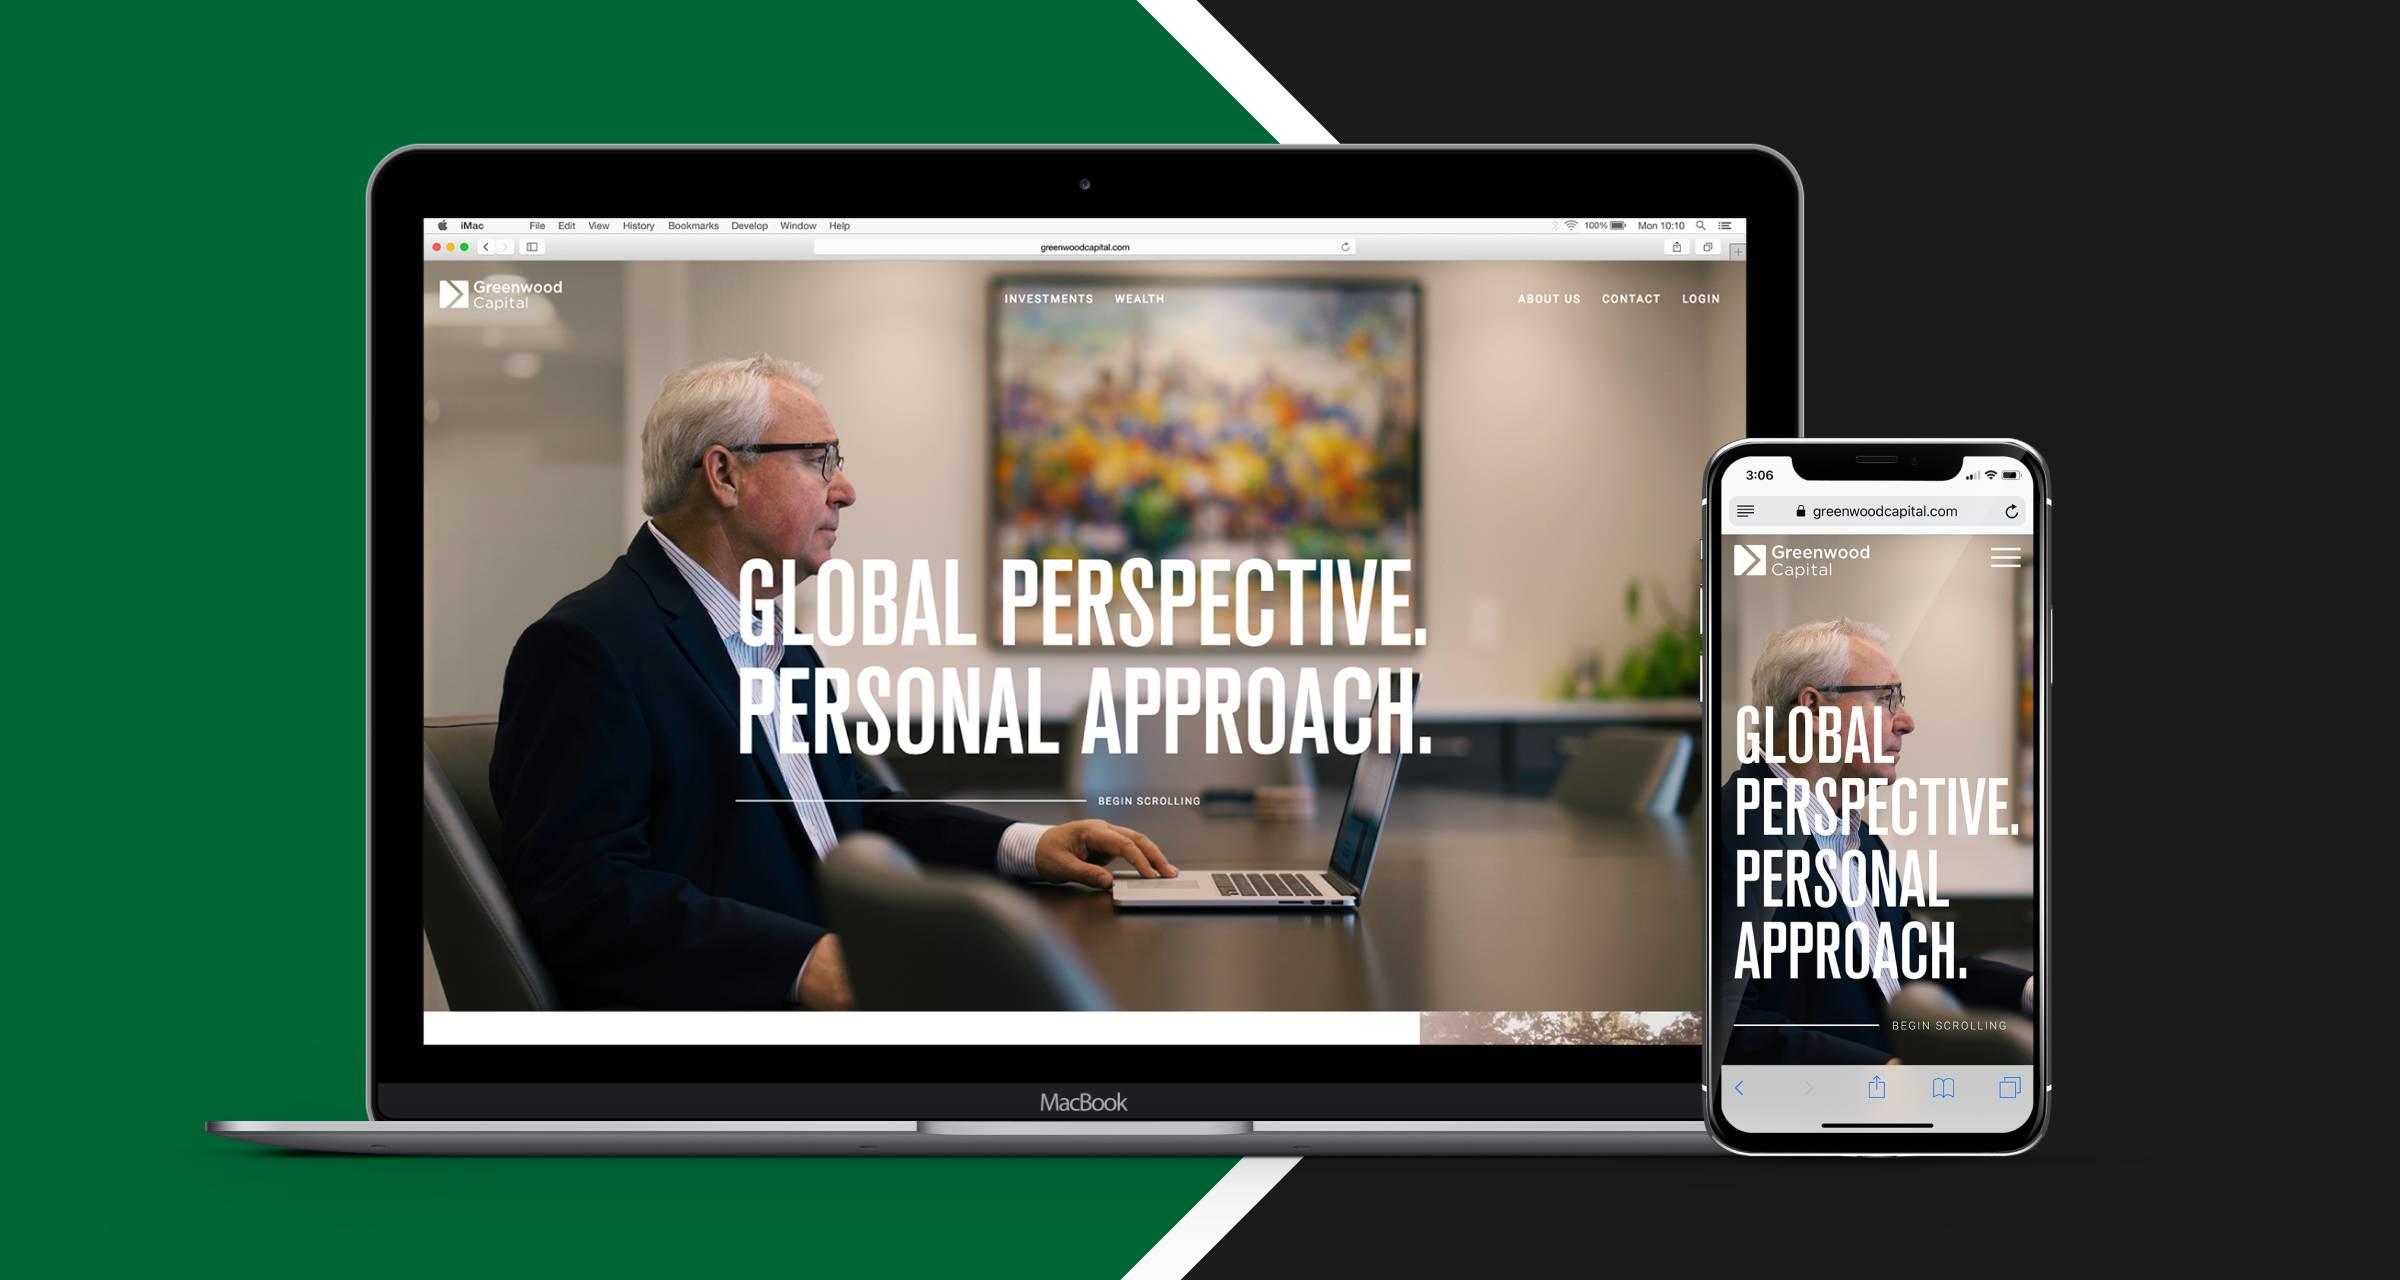 greenwood-capital-web-design-computer-mockup